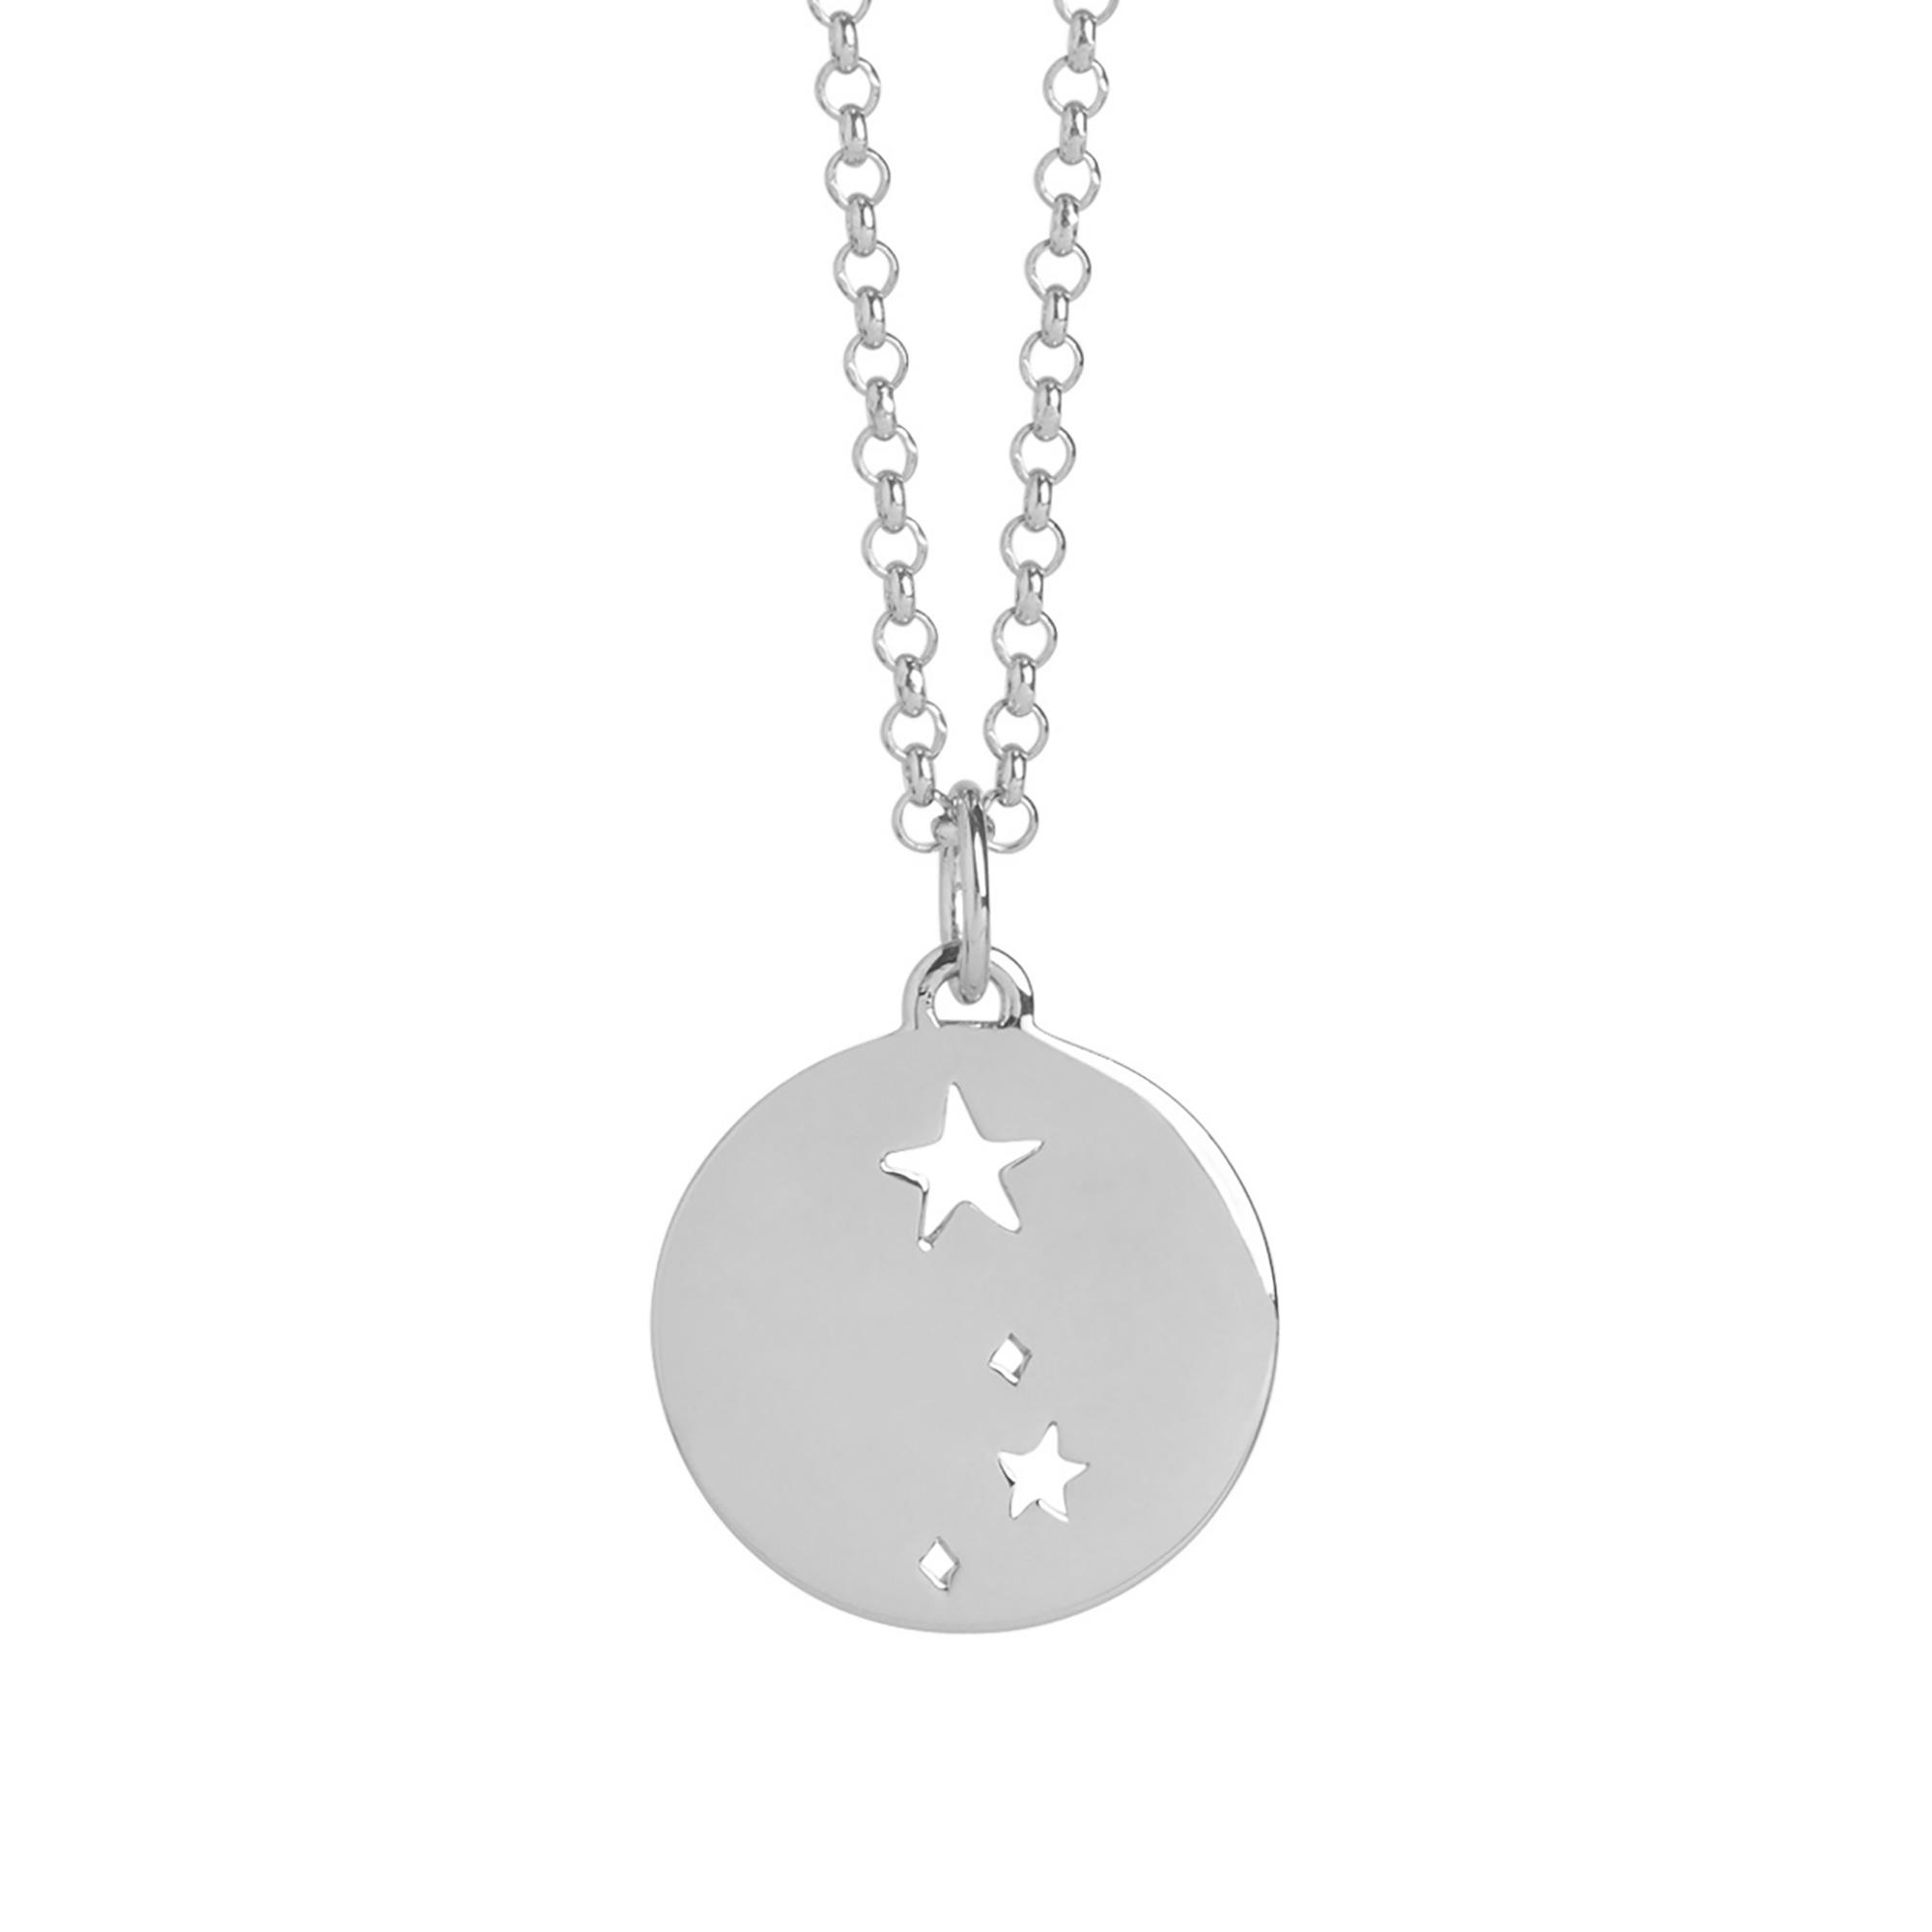 Muru Aries Star Sign Necklace Silver